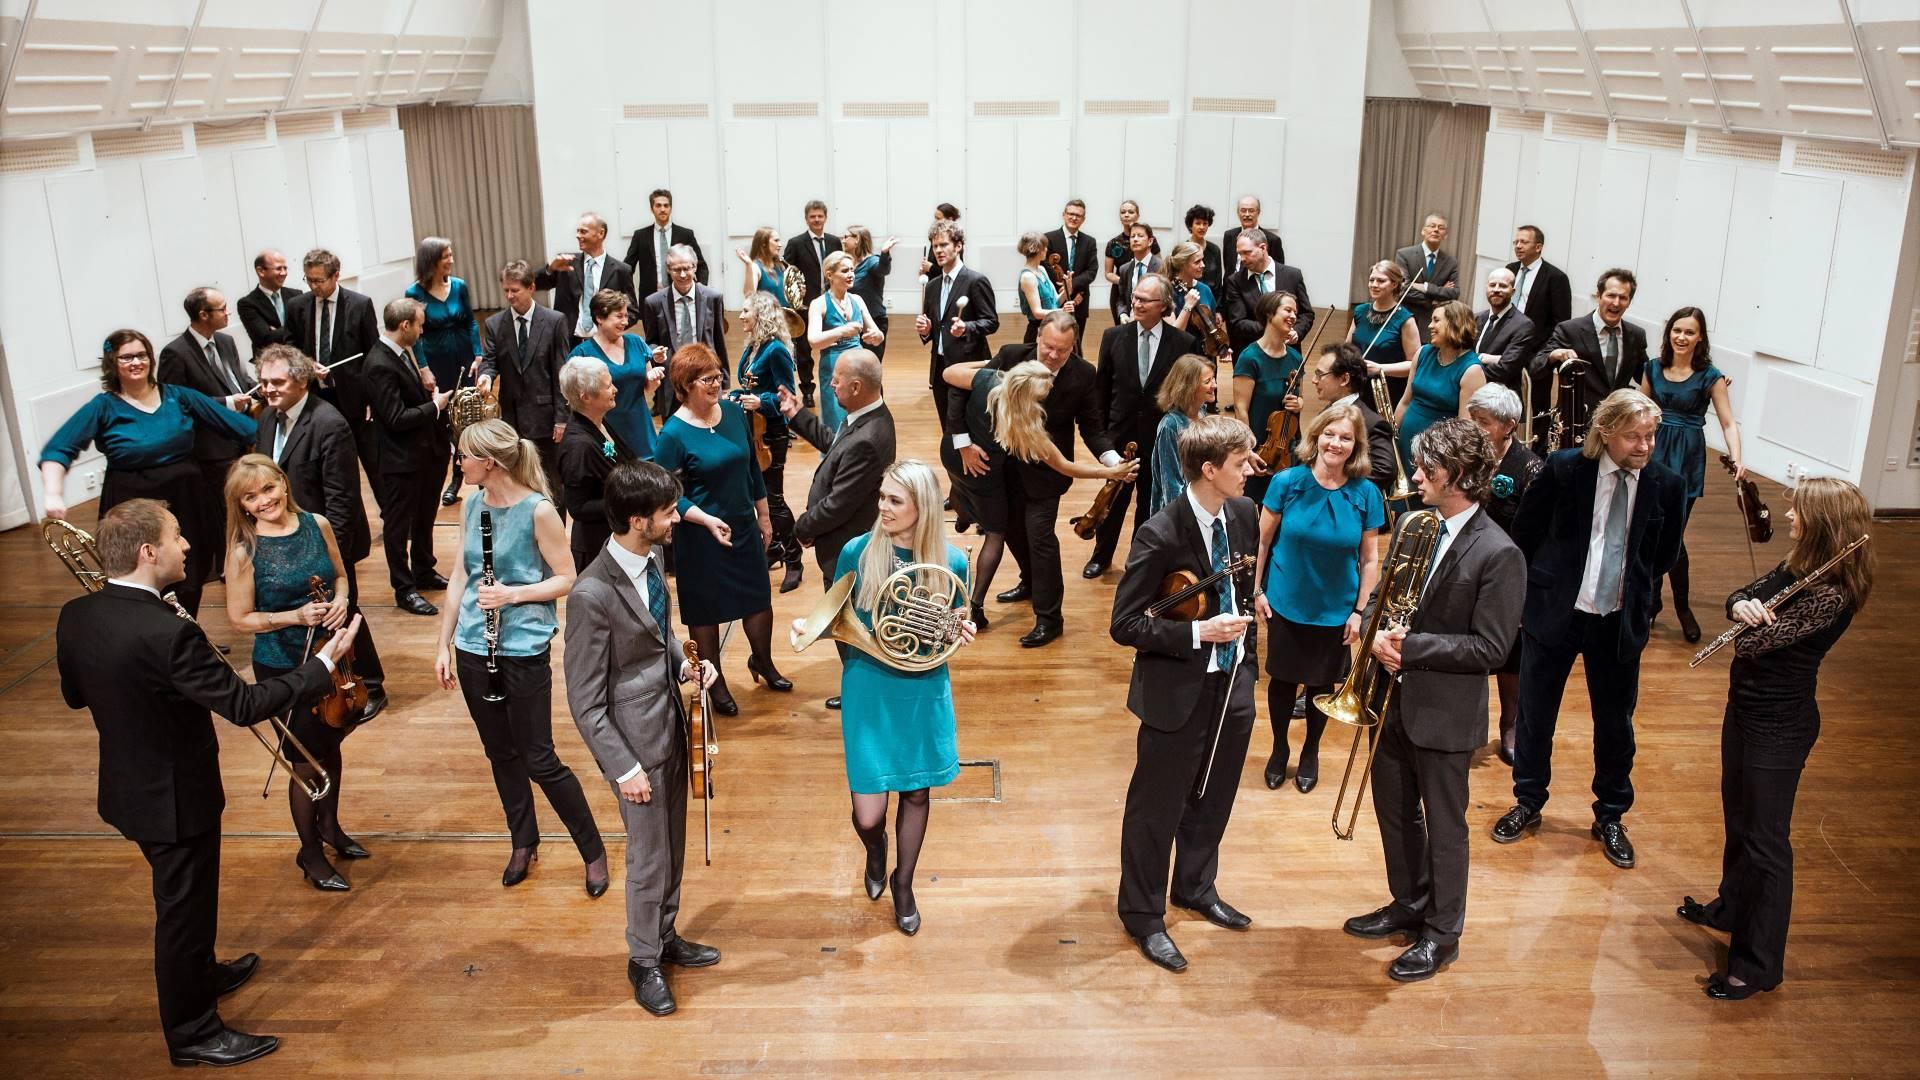 Norwegian Broadcasting Corporation's orchestra KORK